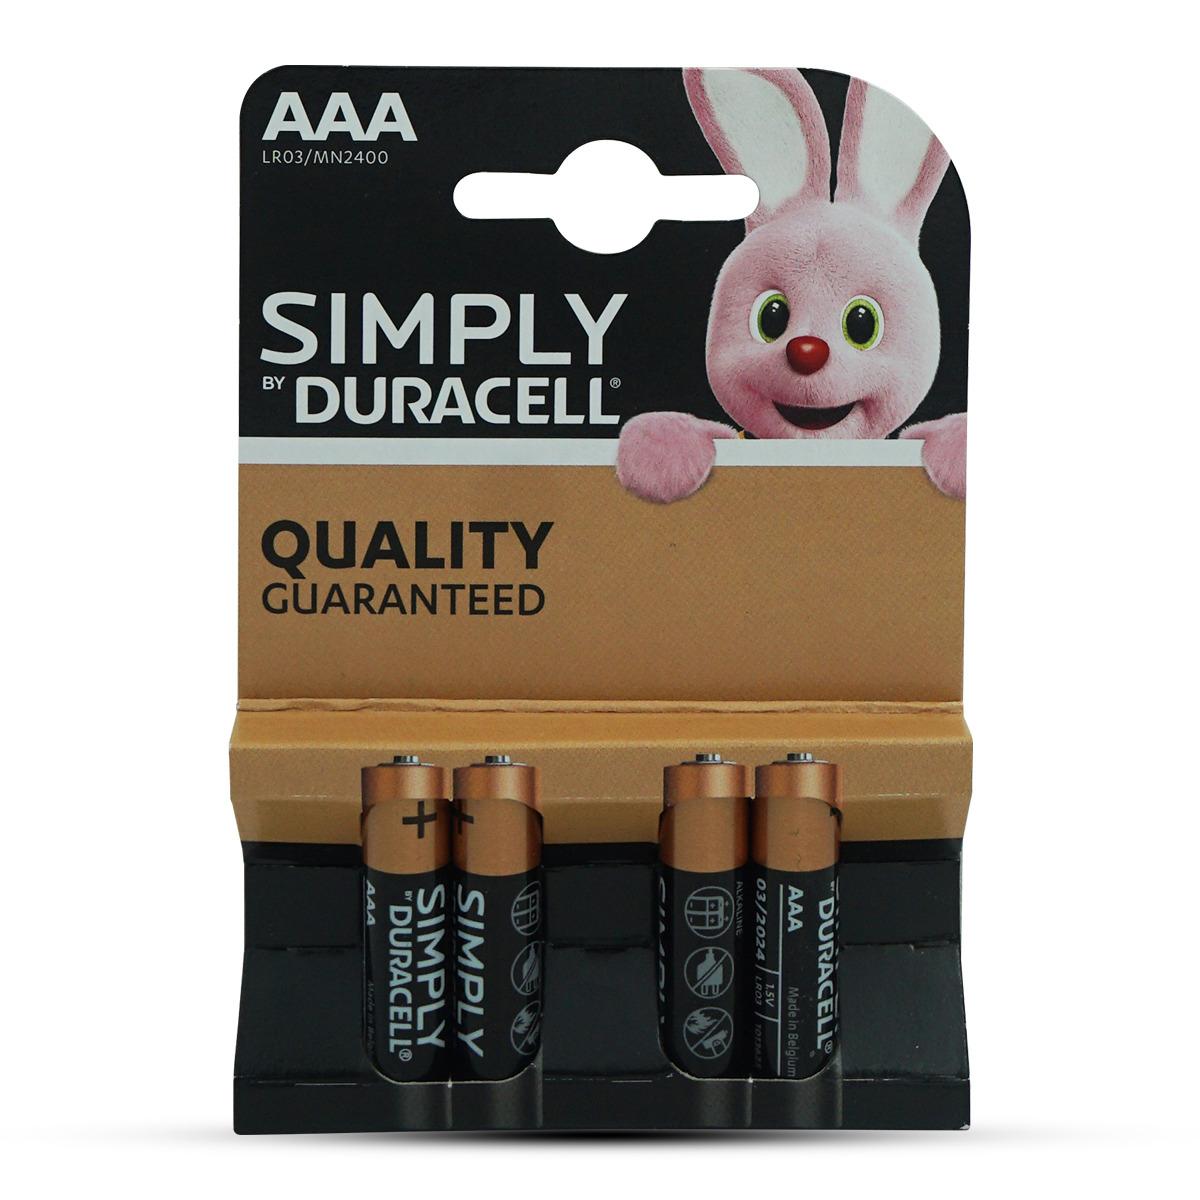 Duracell Simply Batterien AAA/LR03 4Stk